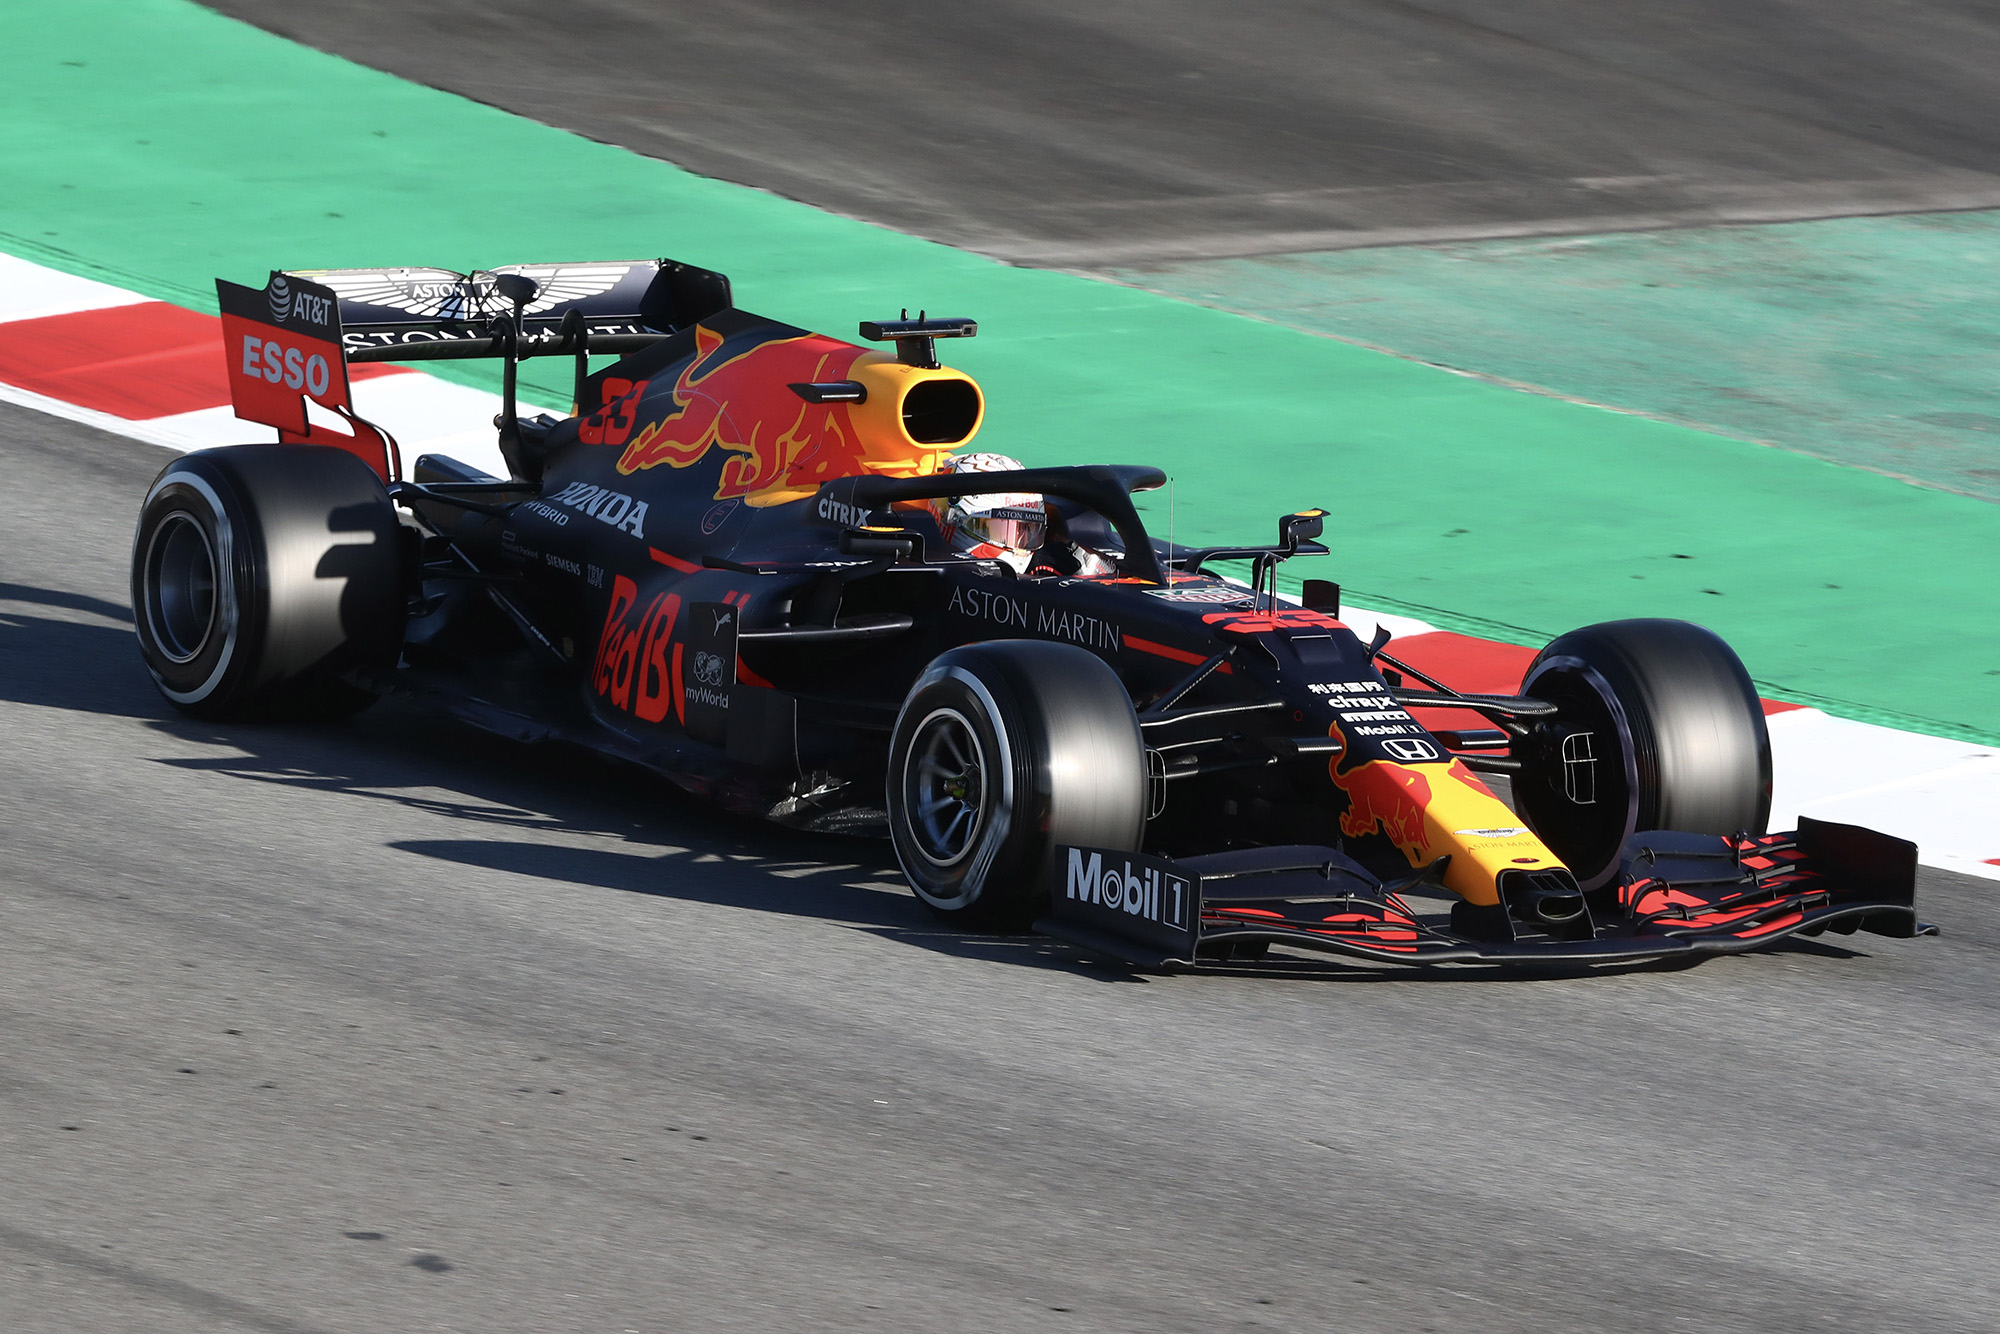 Max Verstappen 2020 F1 testing